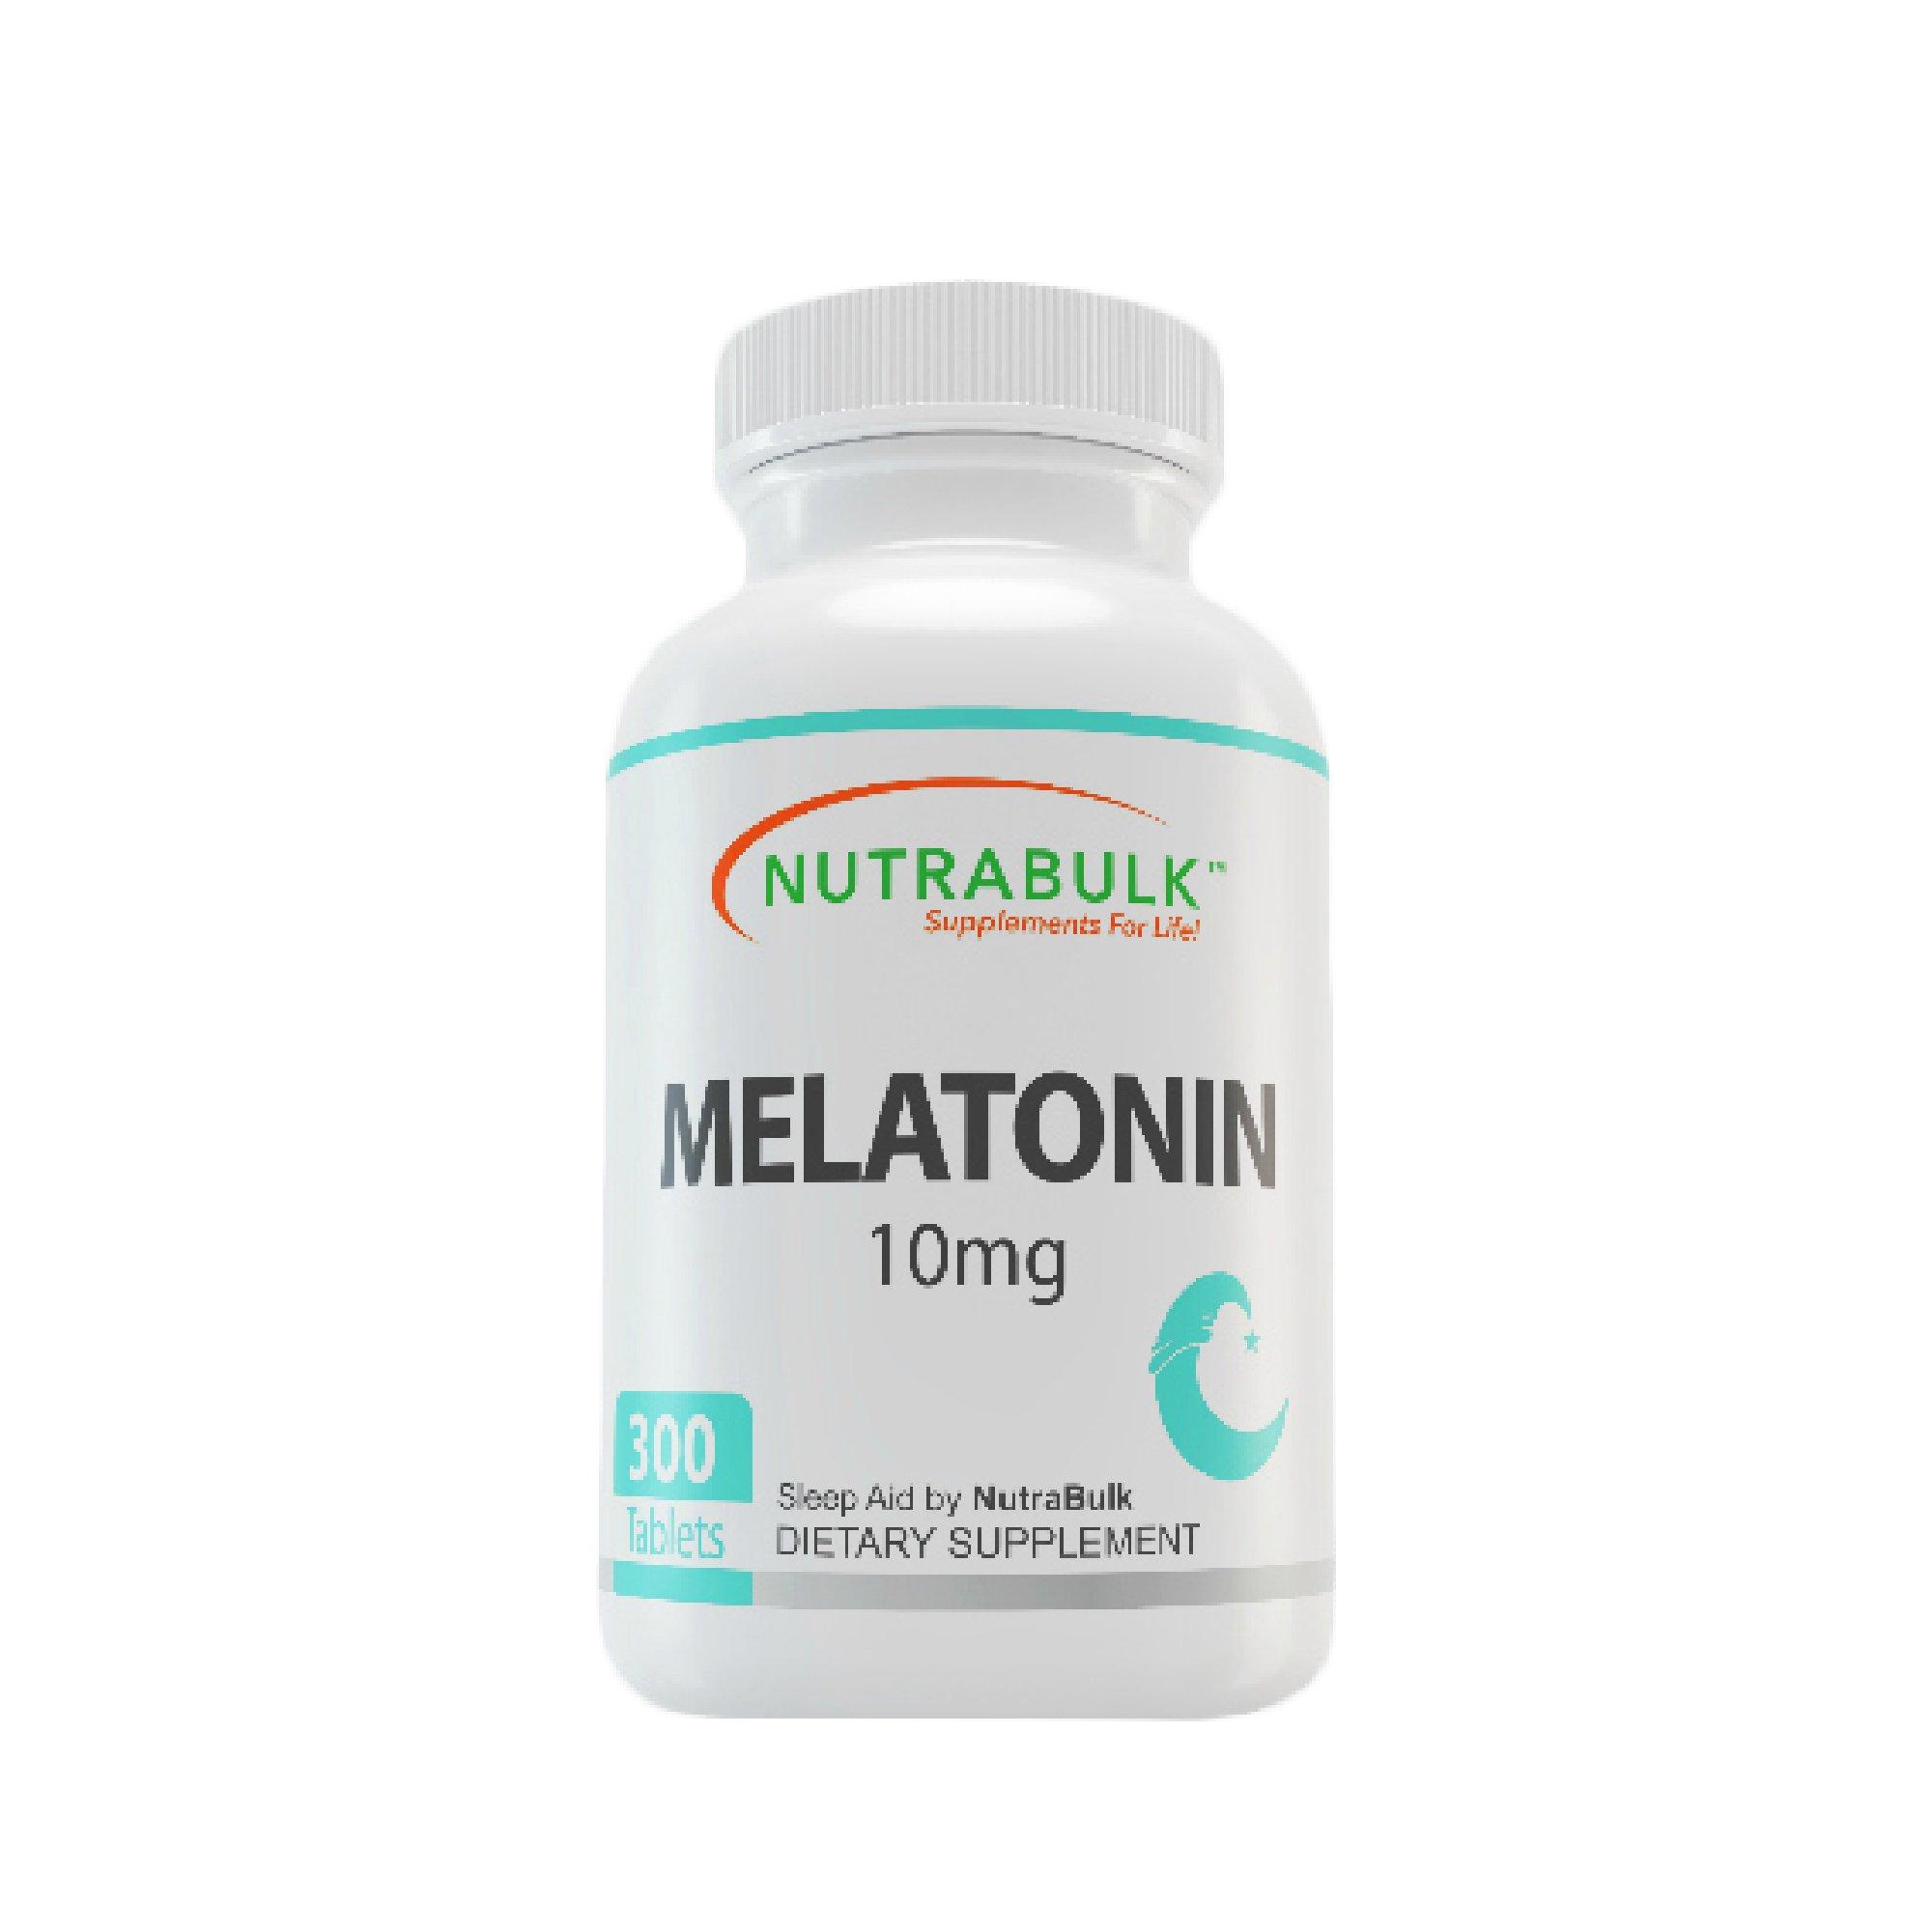 NutraBulk Melatonin 10mg - 300 Tablets – Quick Release Natural Nighttime Sleep Aid